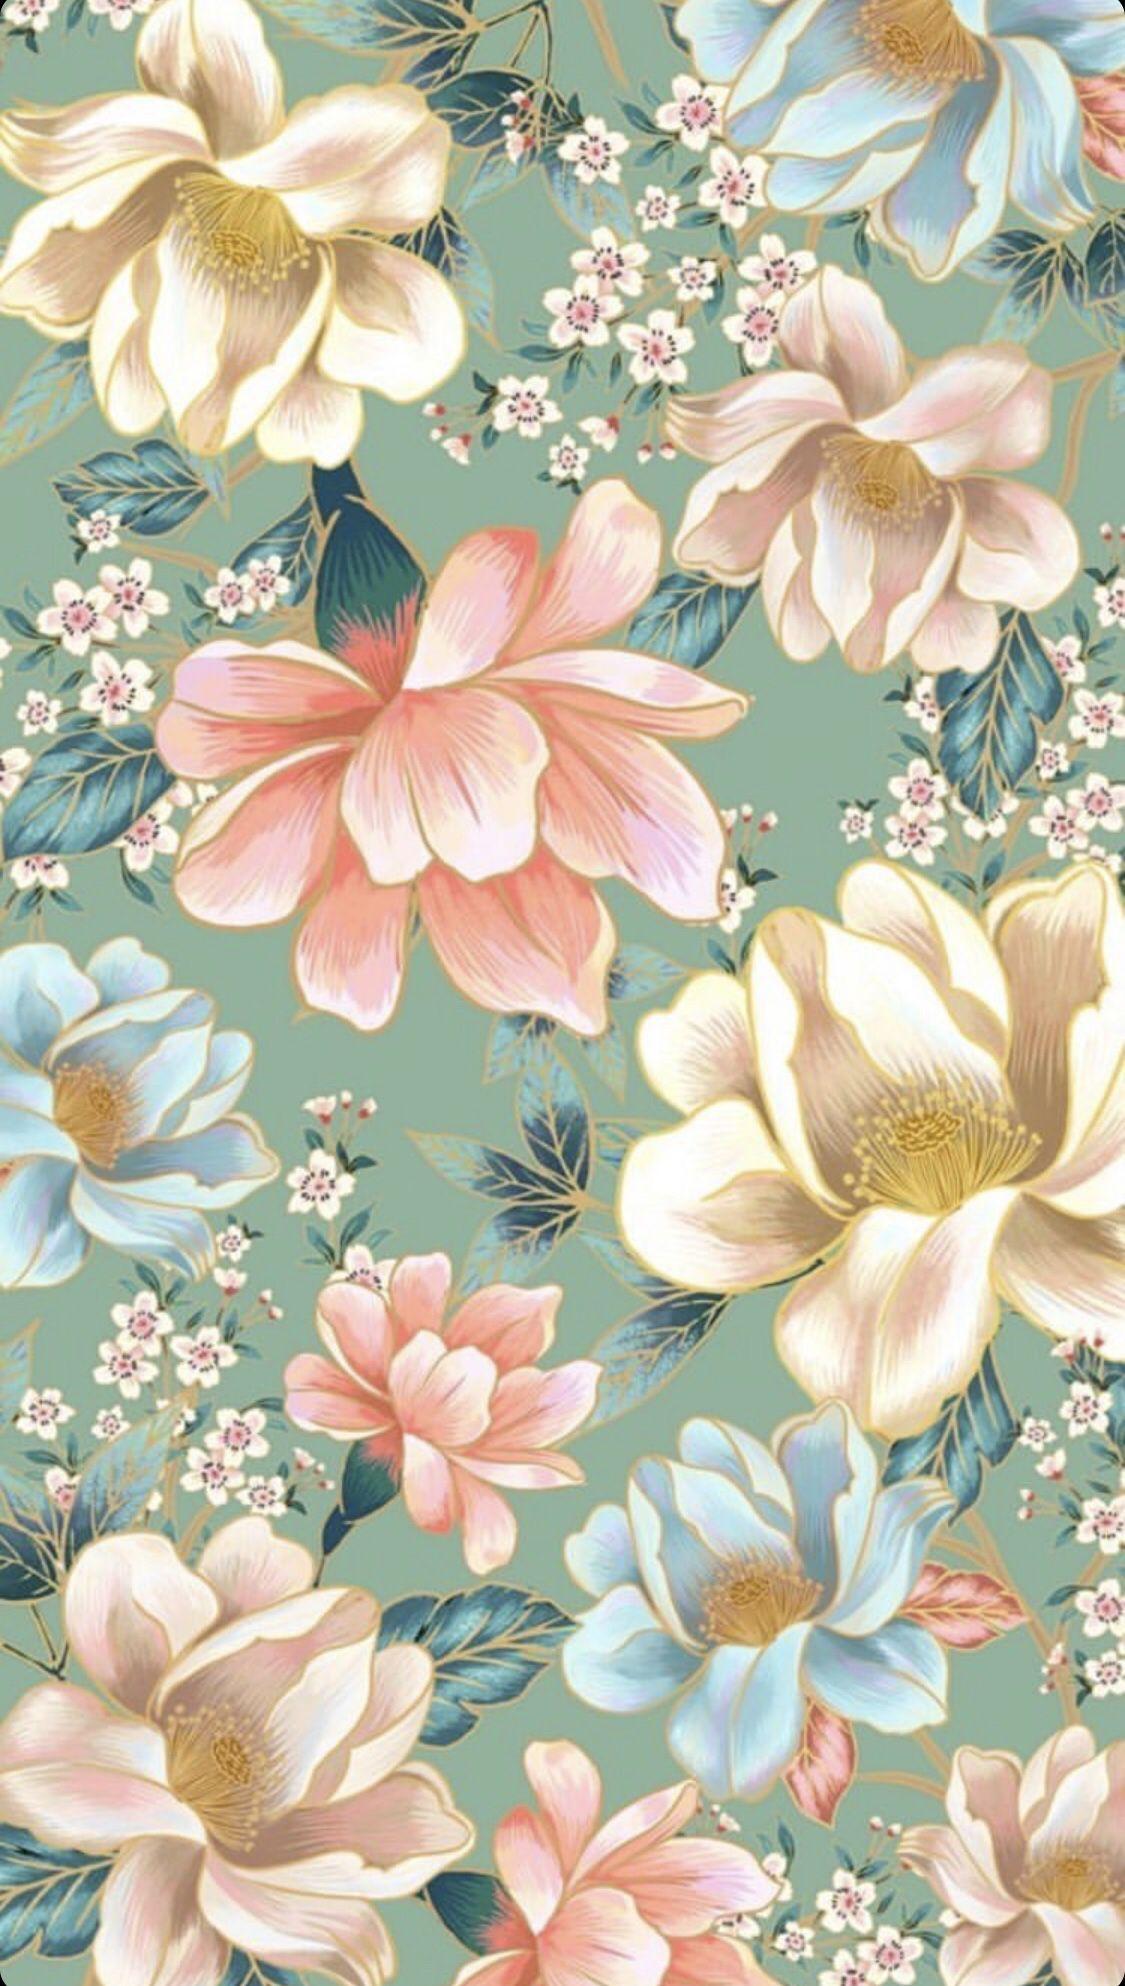 Vintage Flowers Floral Pattern Wallpaper